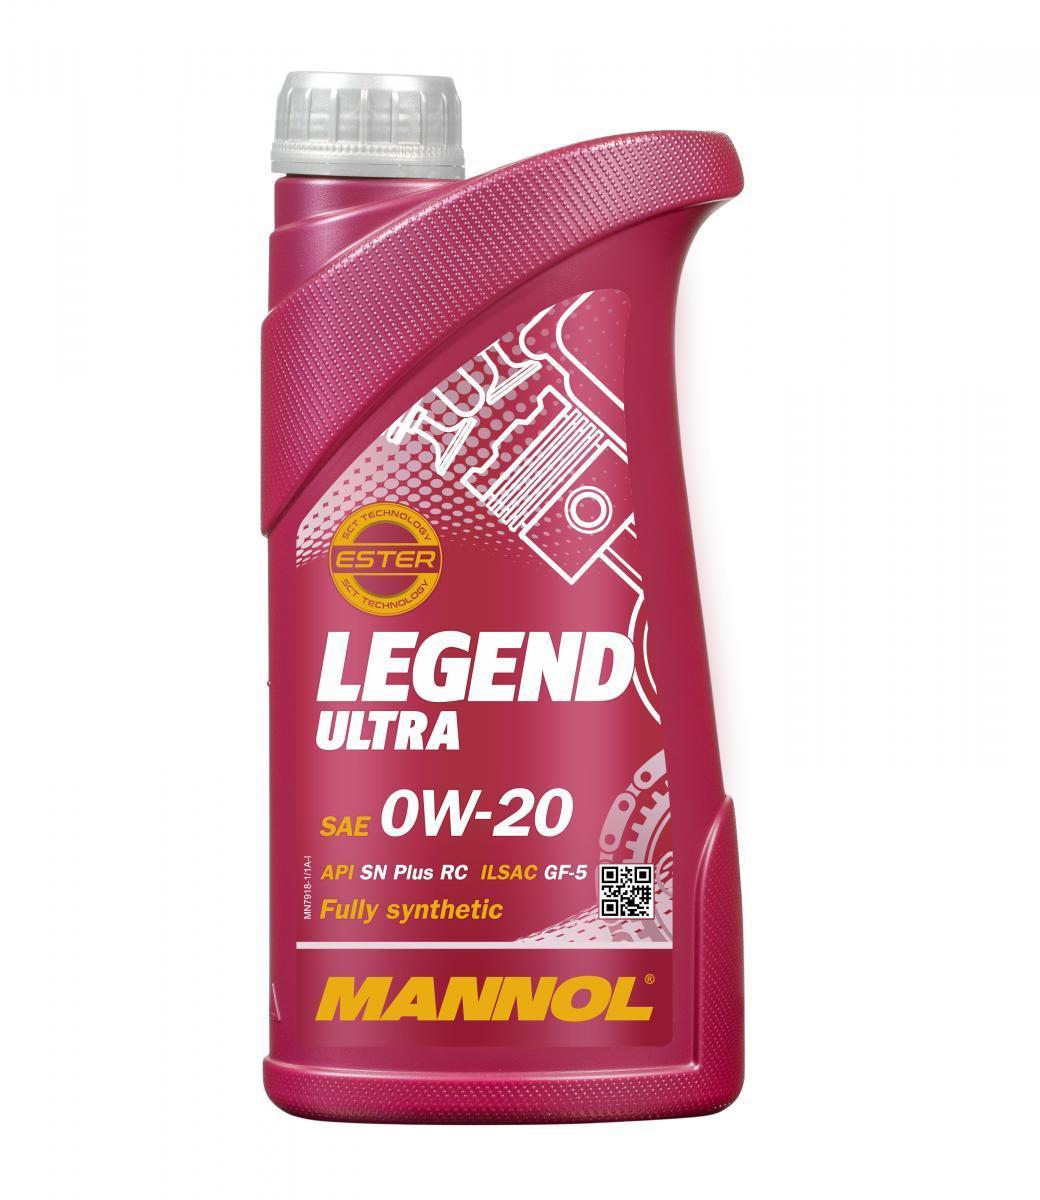 MANNOL LEGEND, ULTRA MN7918-1 Motoröl